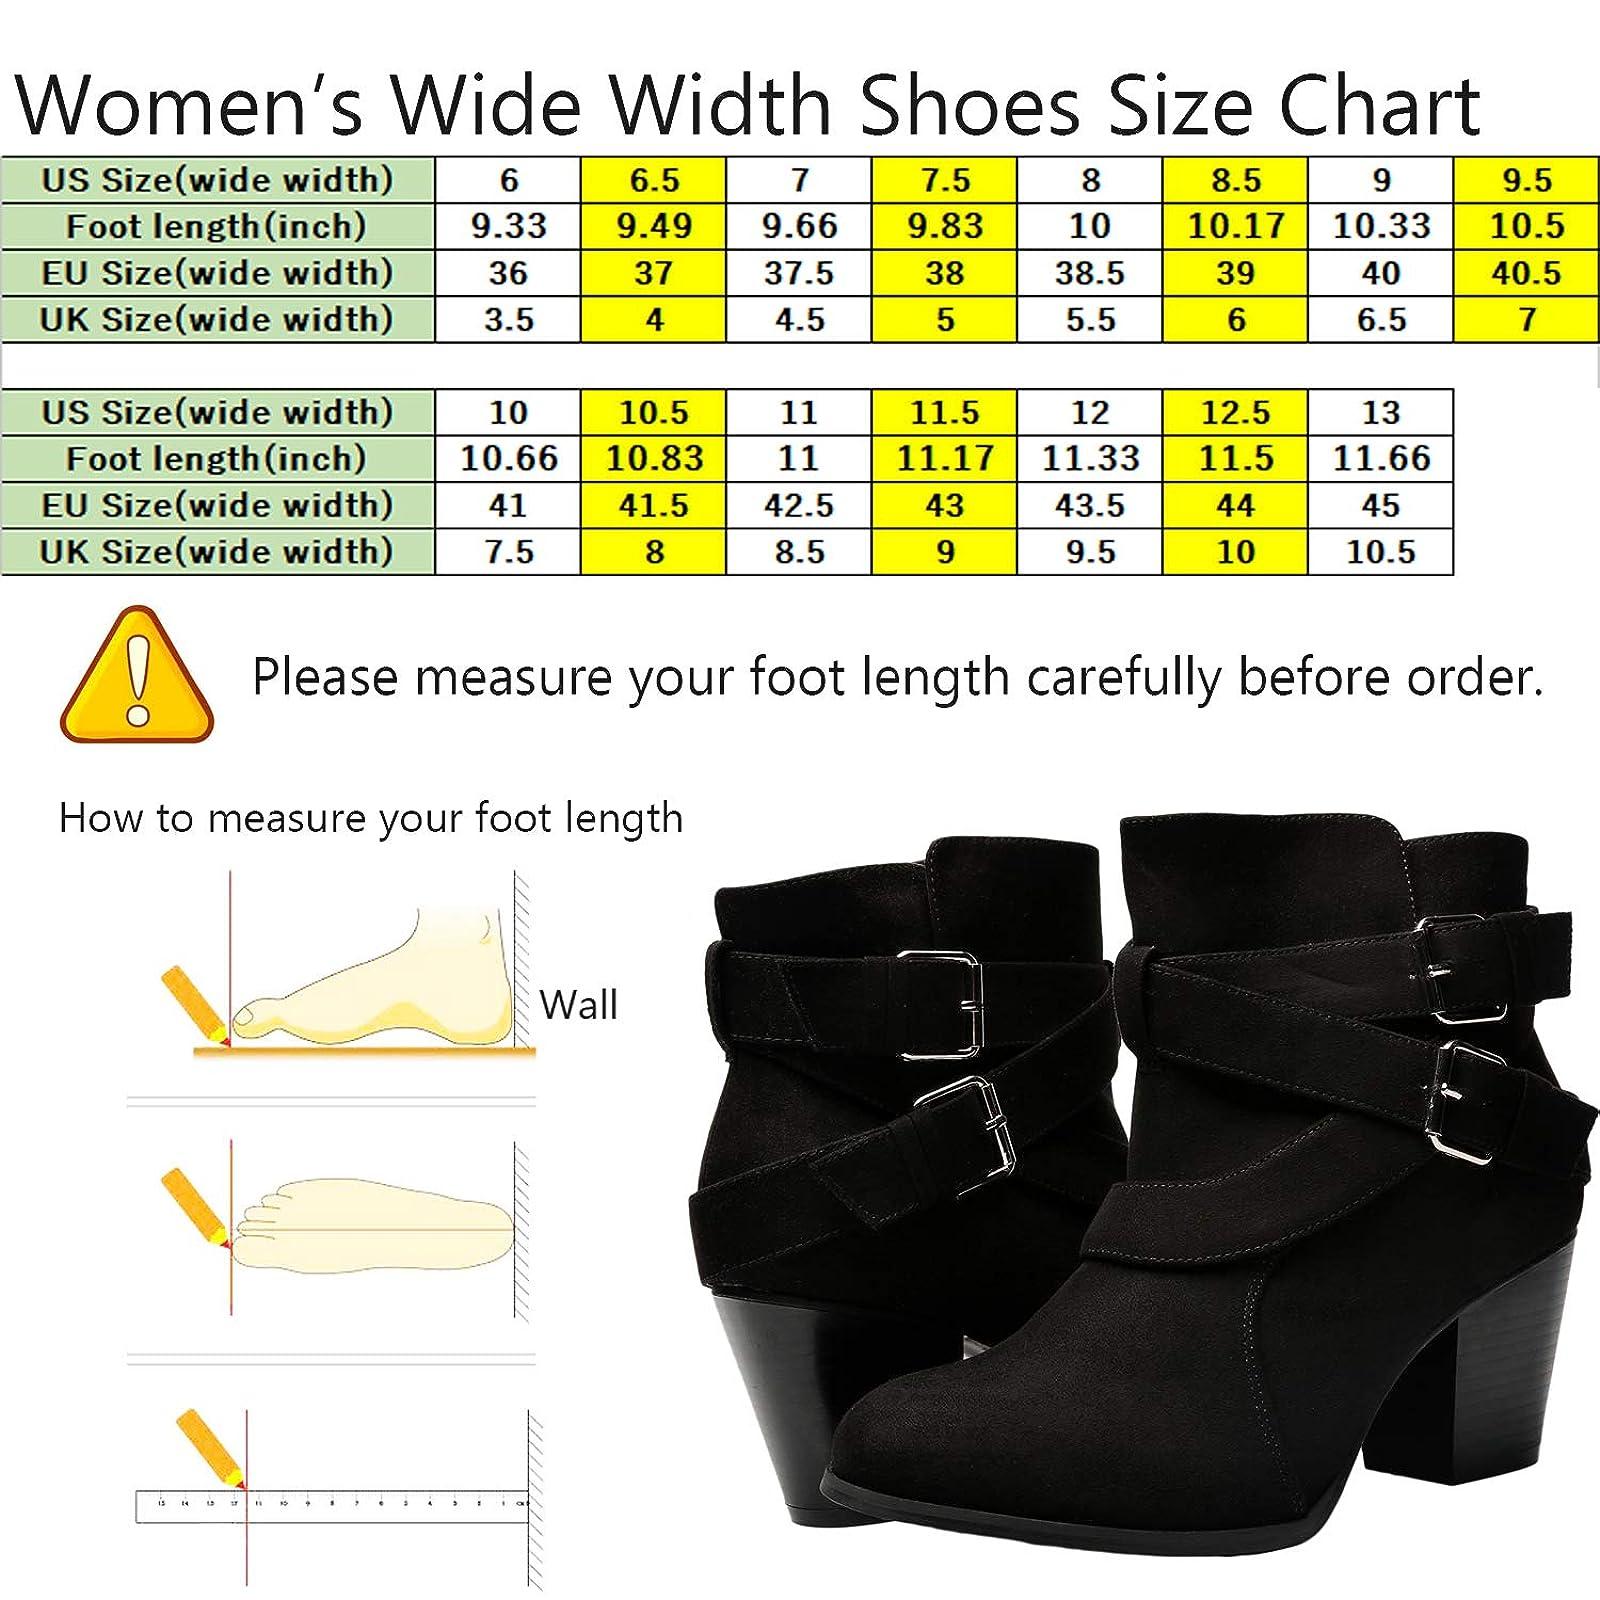 Luoika Women's Wide Width Ankle Boots - Black 10 XW US - 1